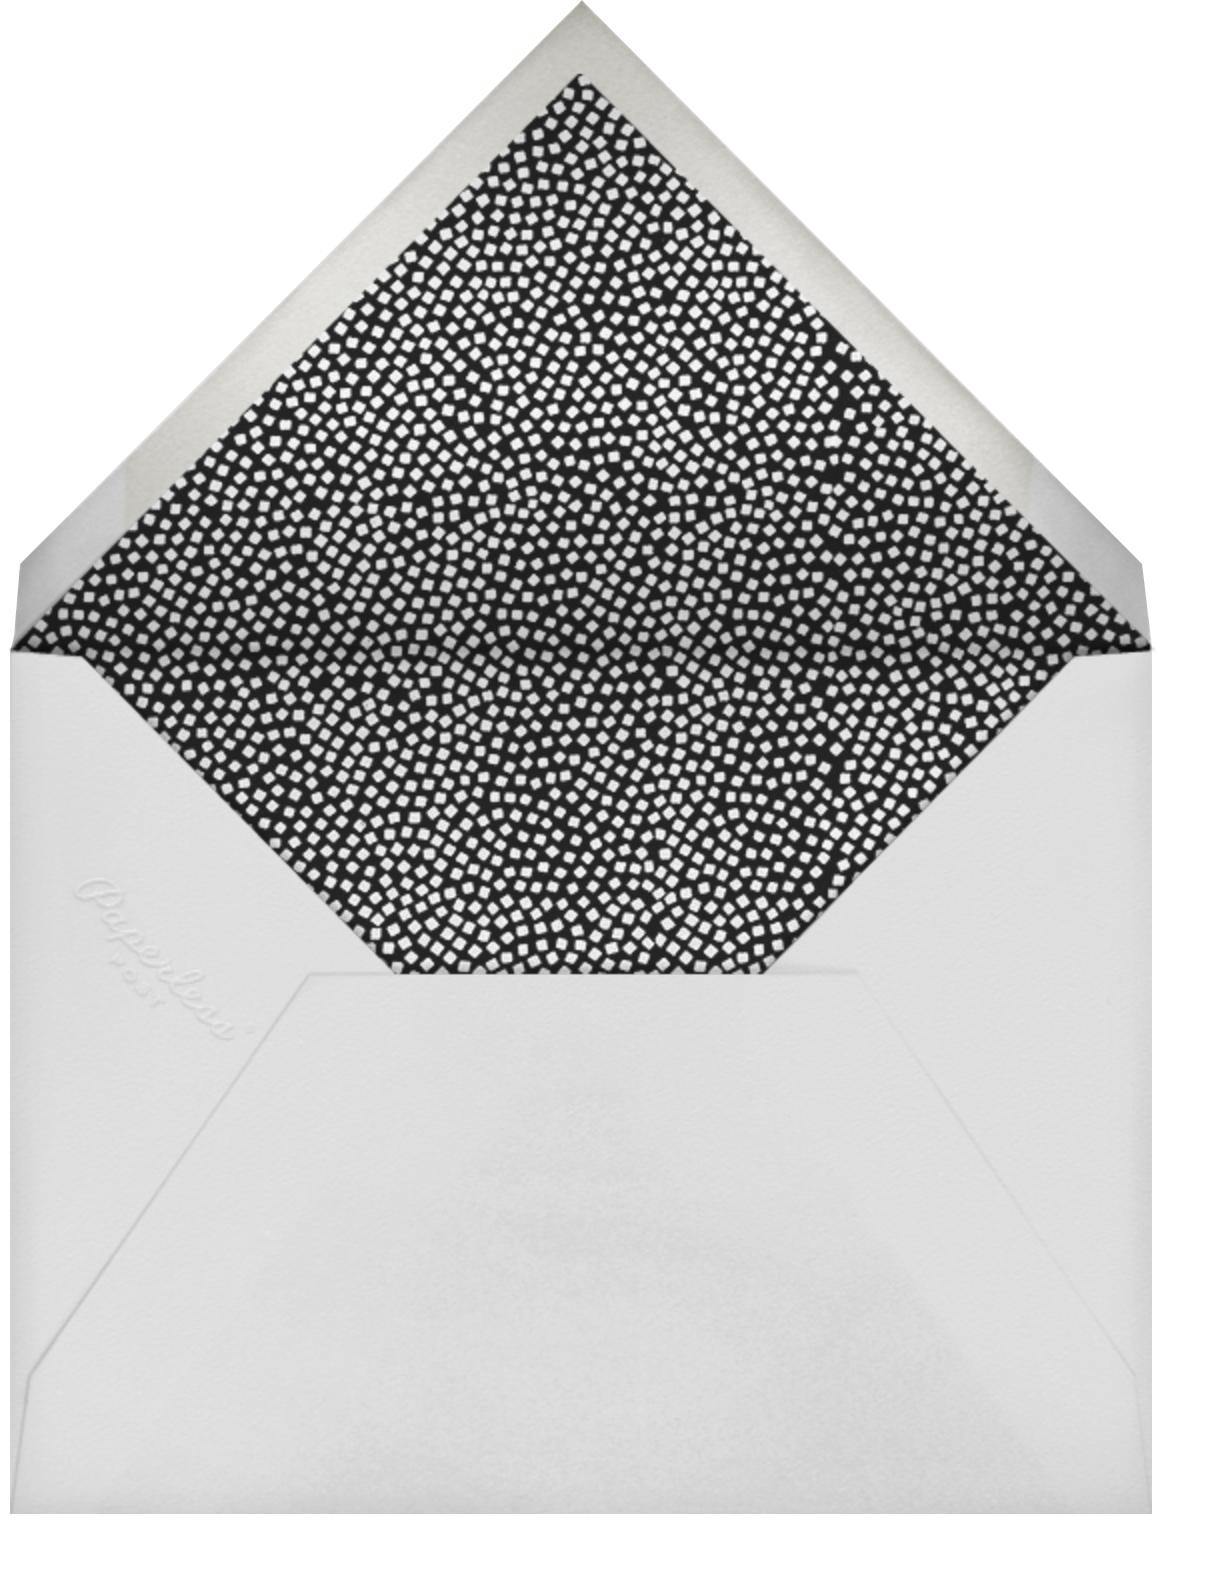 Kinetic Flow (Tall) - Kelly Wearstler - Professional events - envelope back